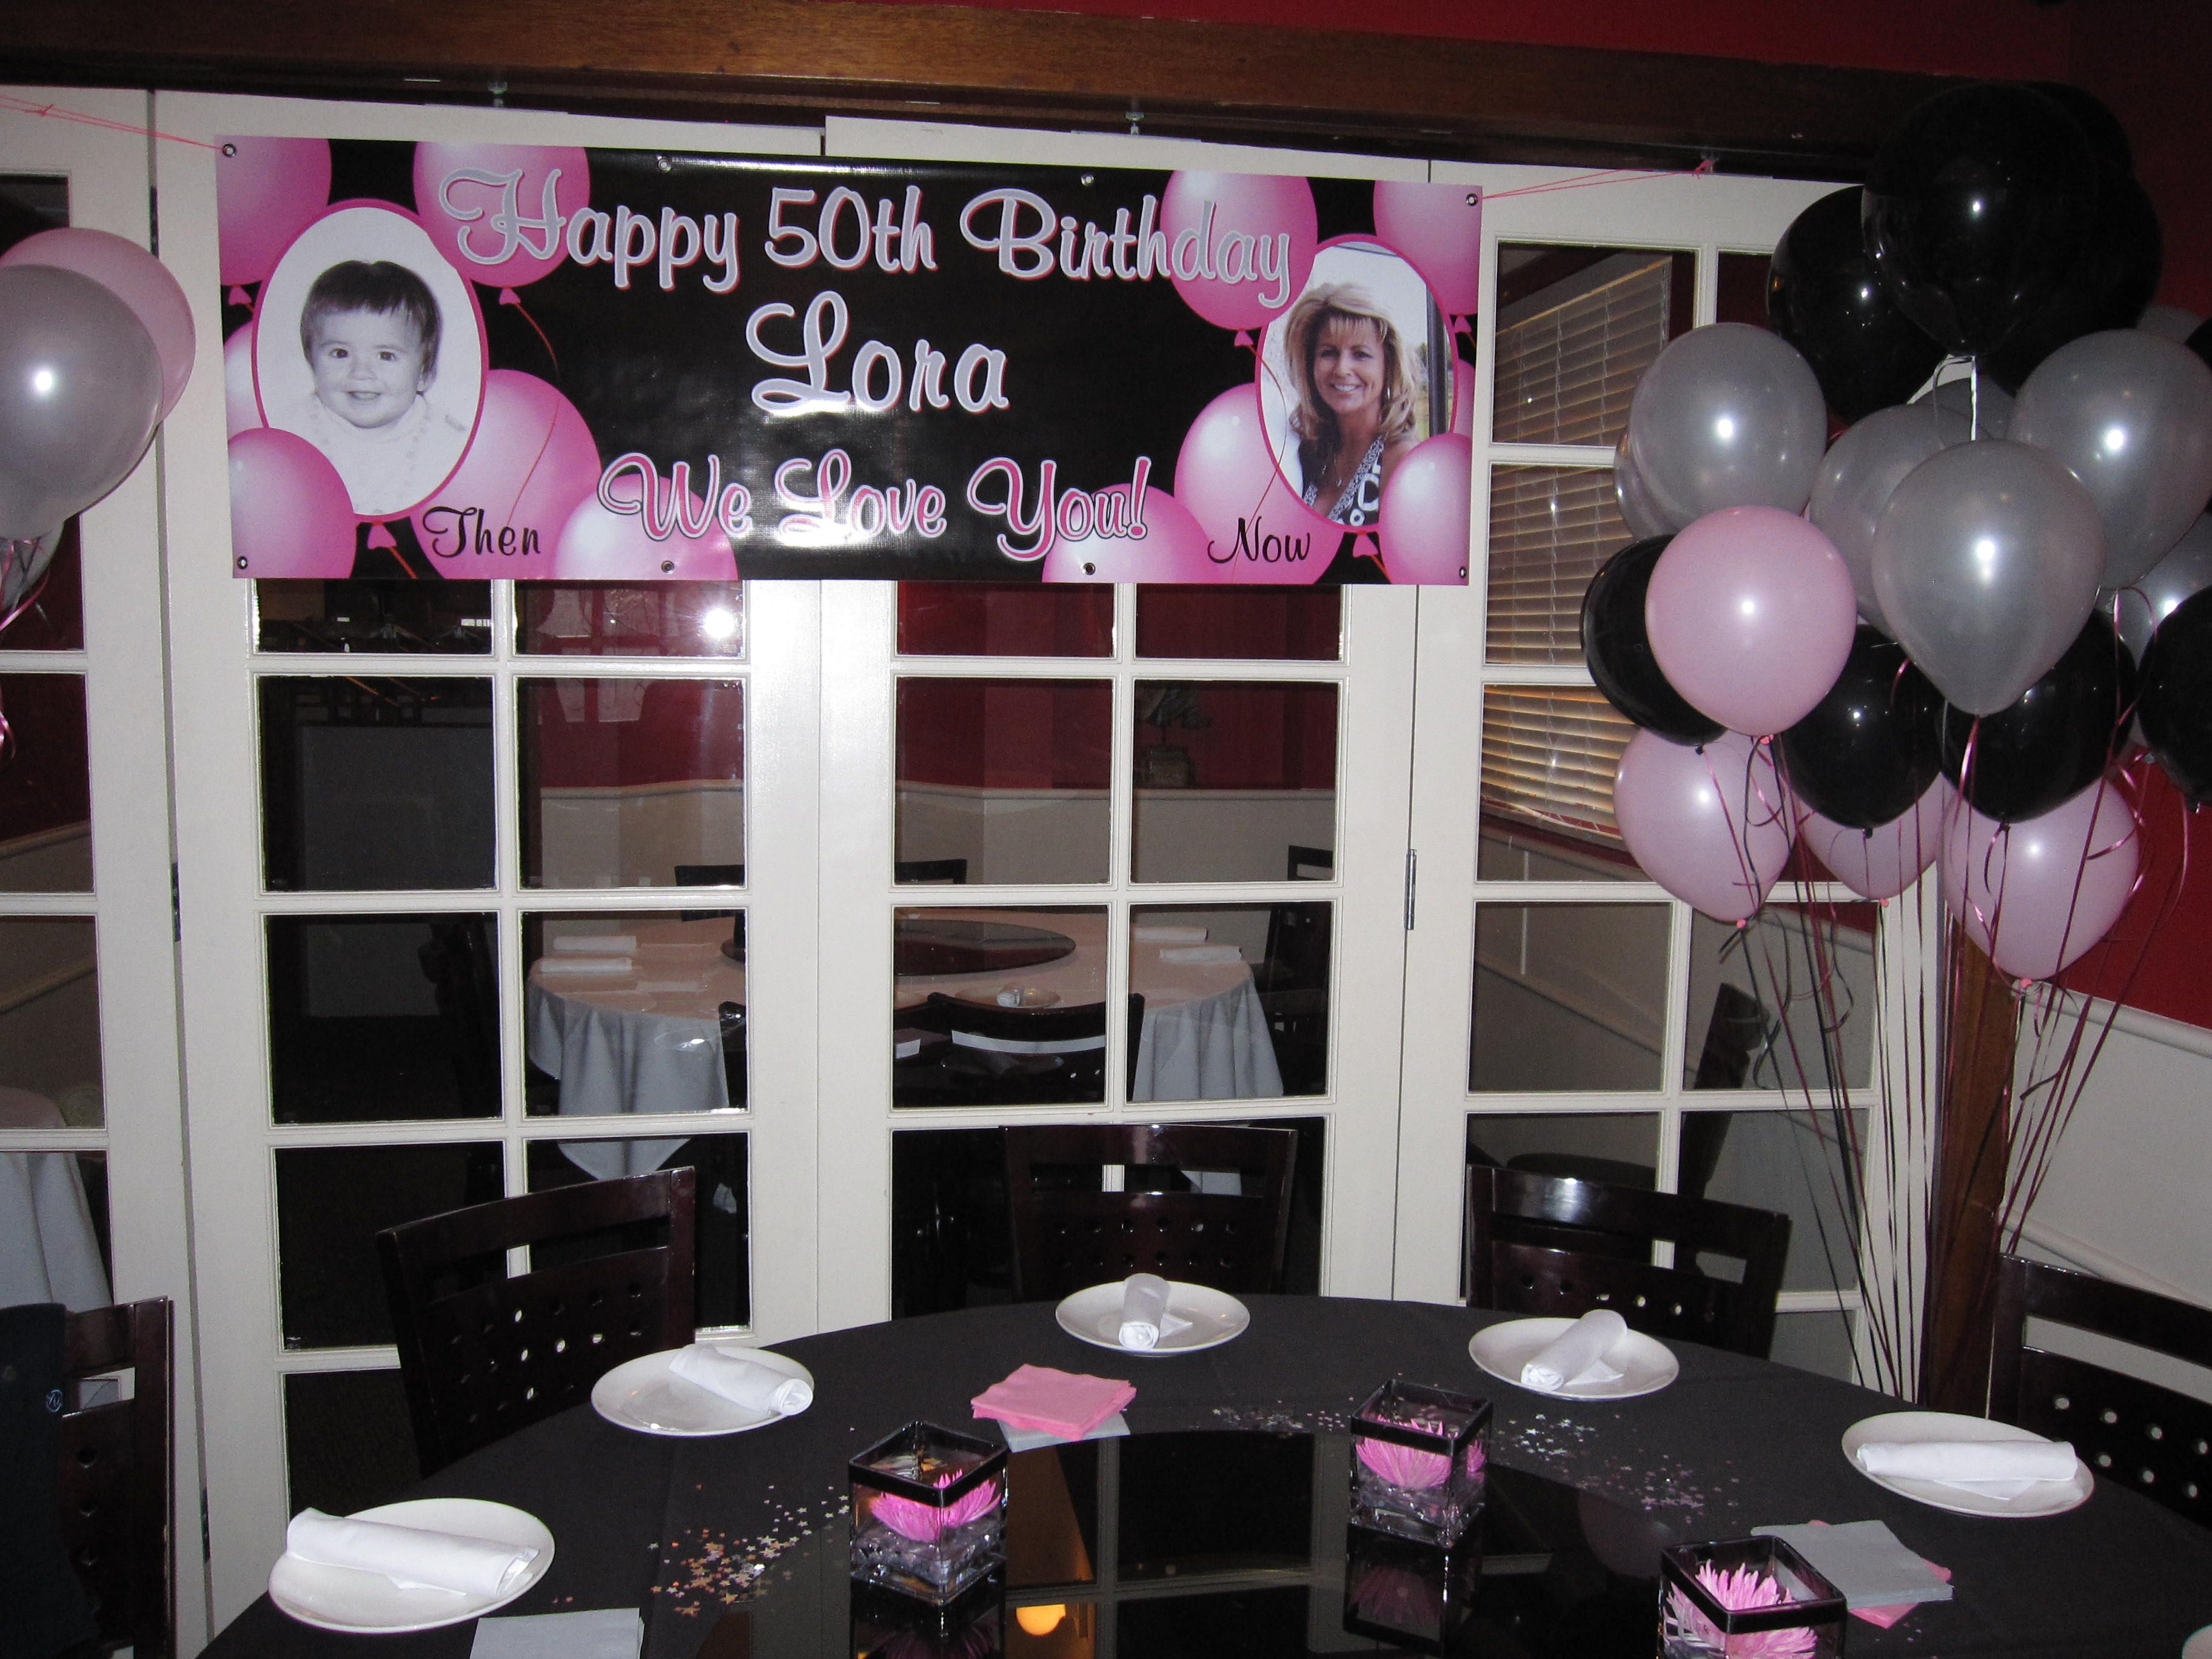 birthday party decor theme pink silver black 50th bday my - 50th Birthday Party Decorations